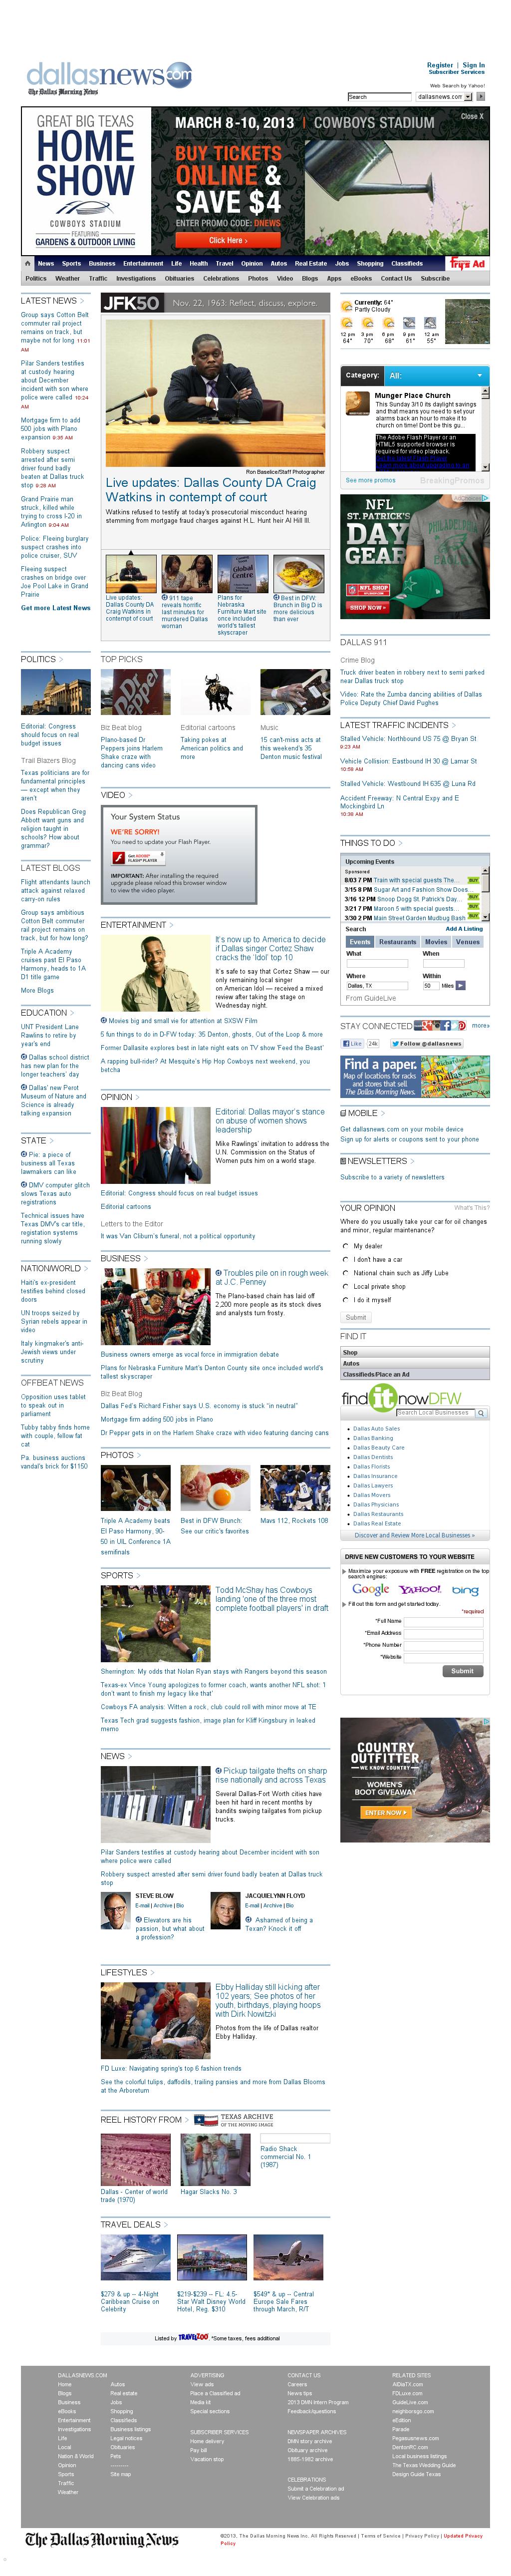 dallasnews.com at Thursday March 7, 2013, 5:03 p.m. UTC